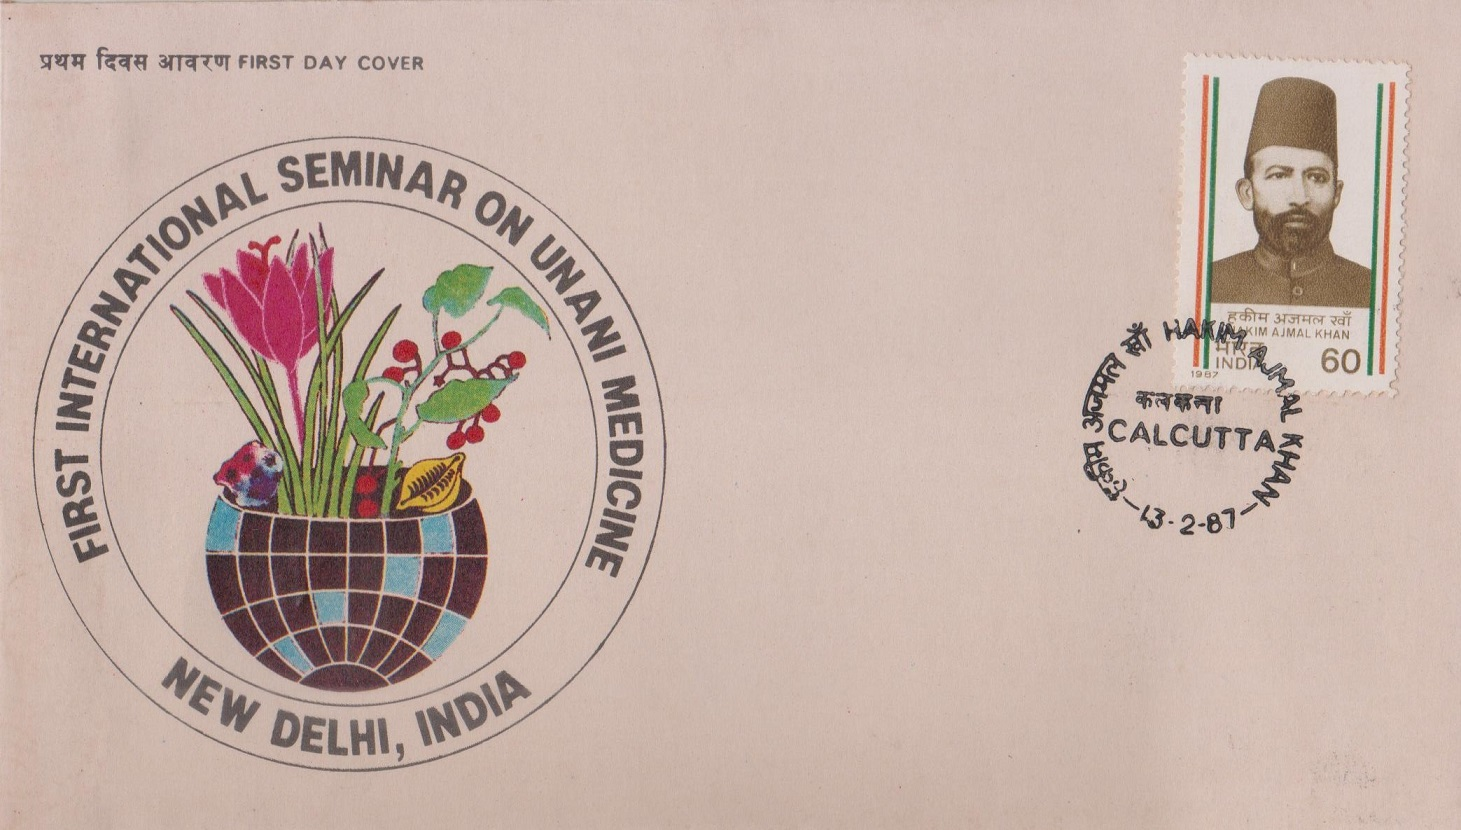 First International Seminar on Unani Medicine, New Delhi, India